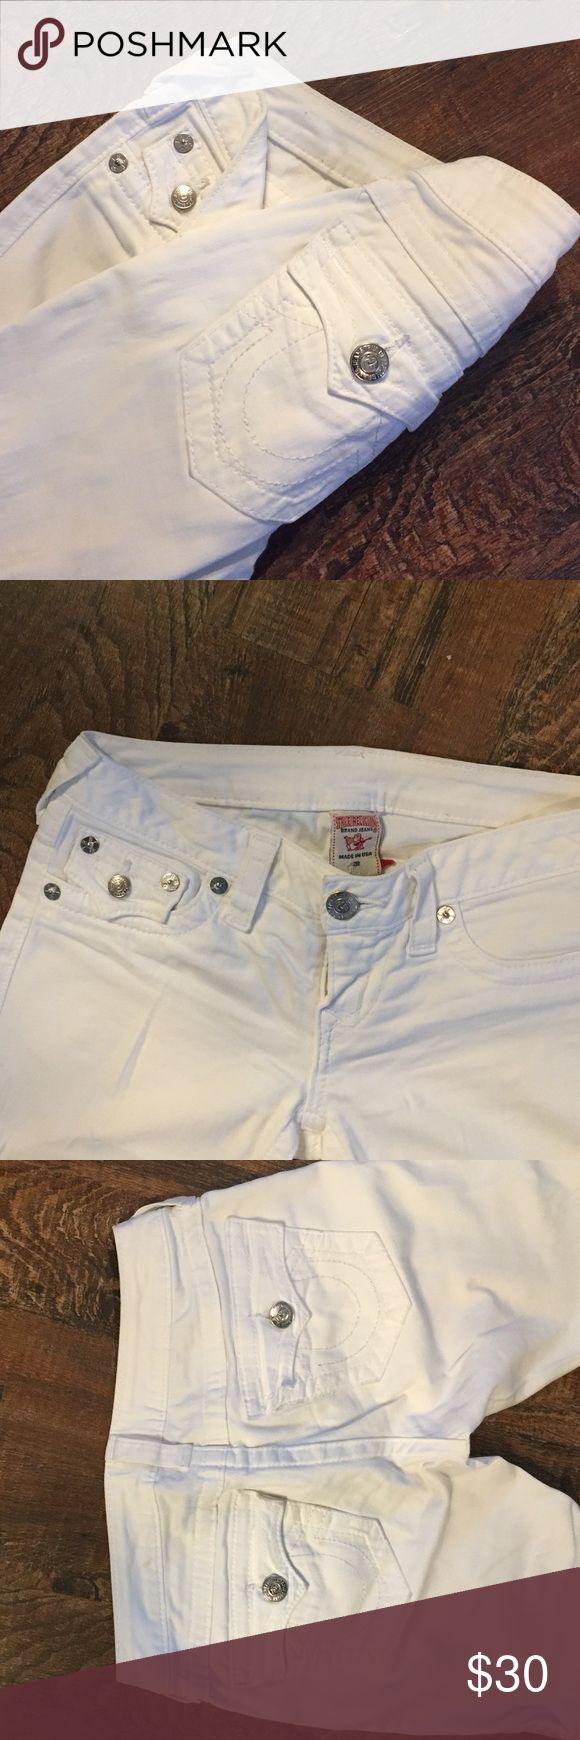 TRUE RELIGION | stretchy soft white bootcut jeans True Religion white bootcut jeans. ☁️ Very comfortable and stretchy! True Religion Jeans Boot Cut